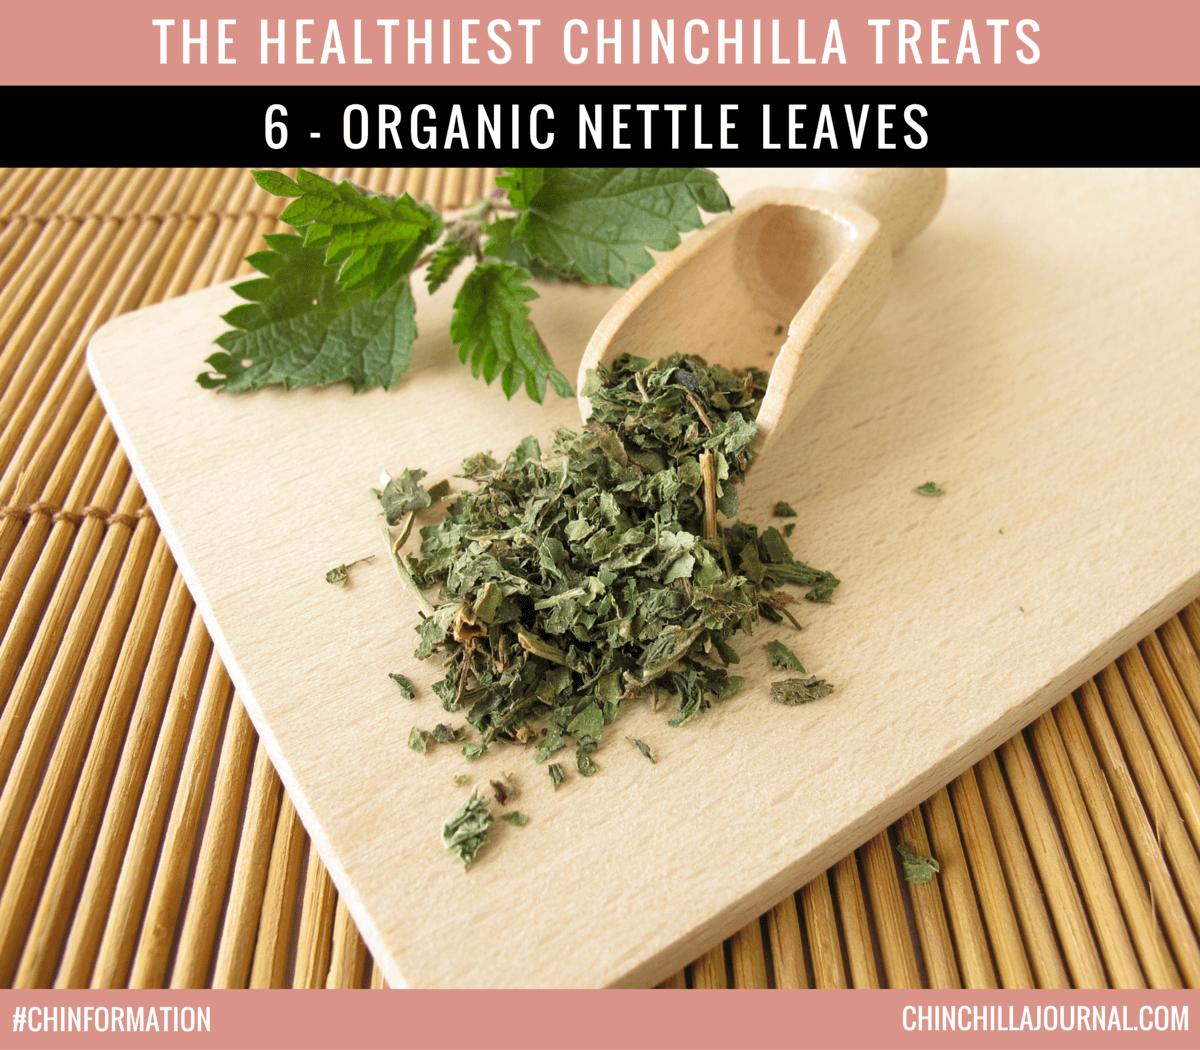 The Healthiest Chinchilla Treats - 6 - Organic Nettle Leaves